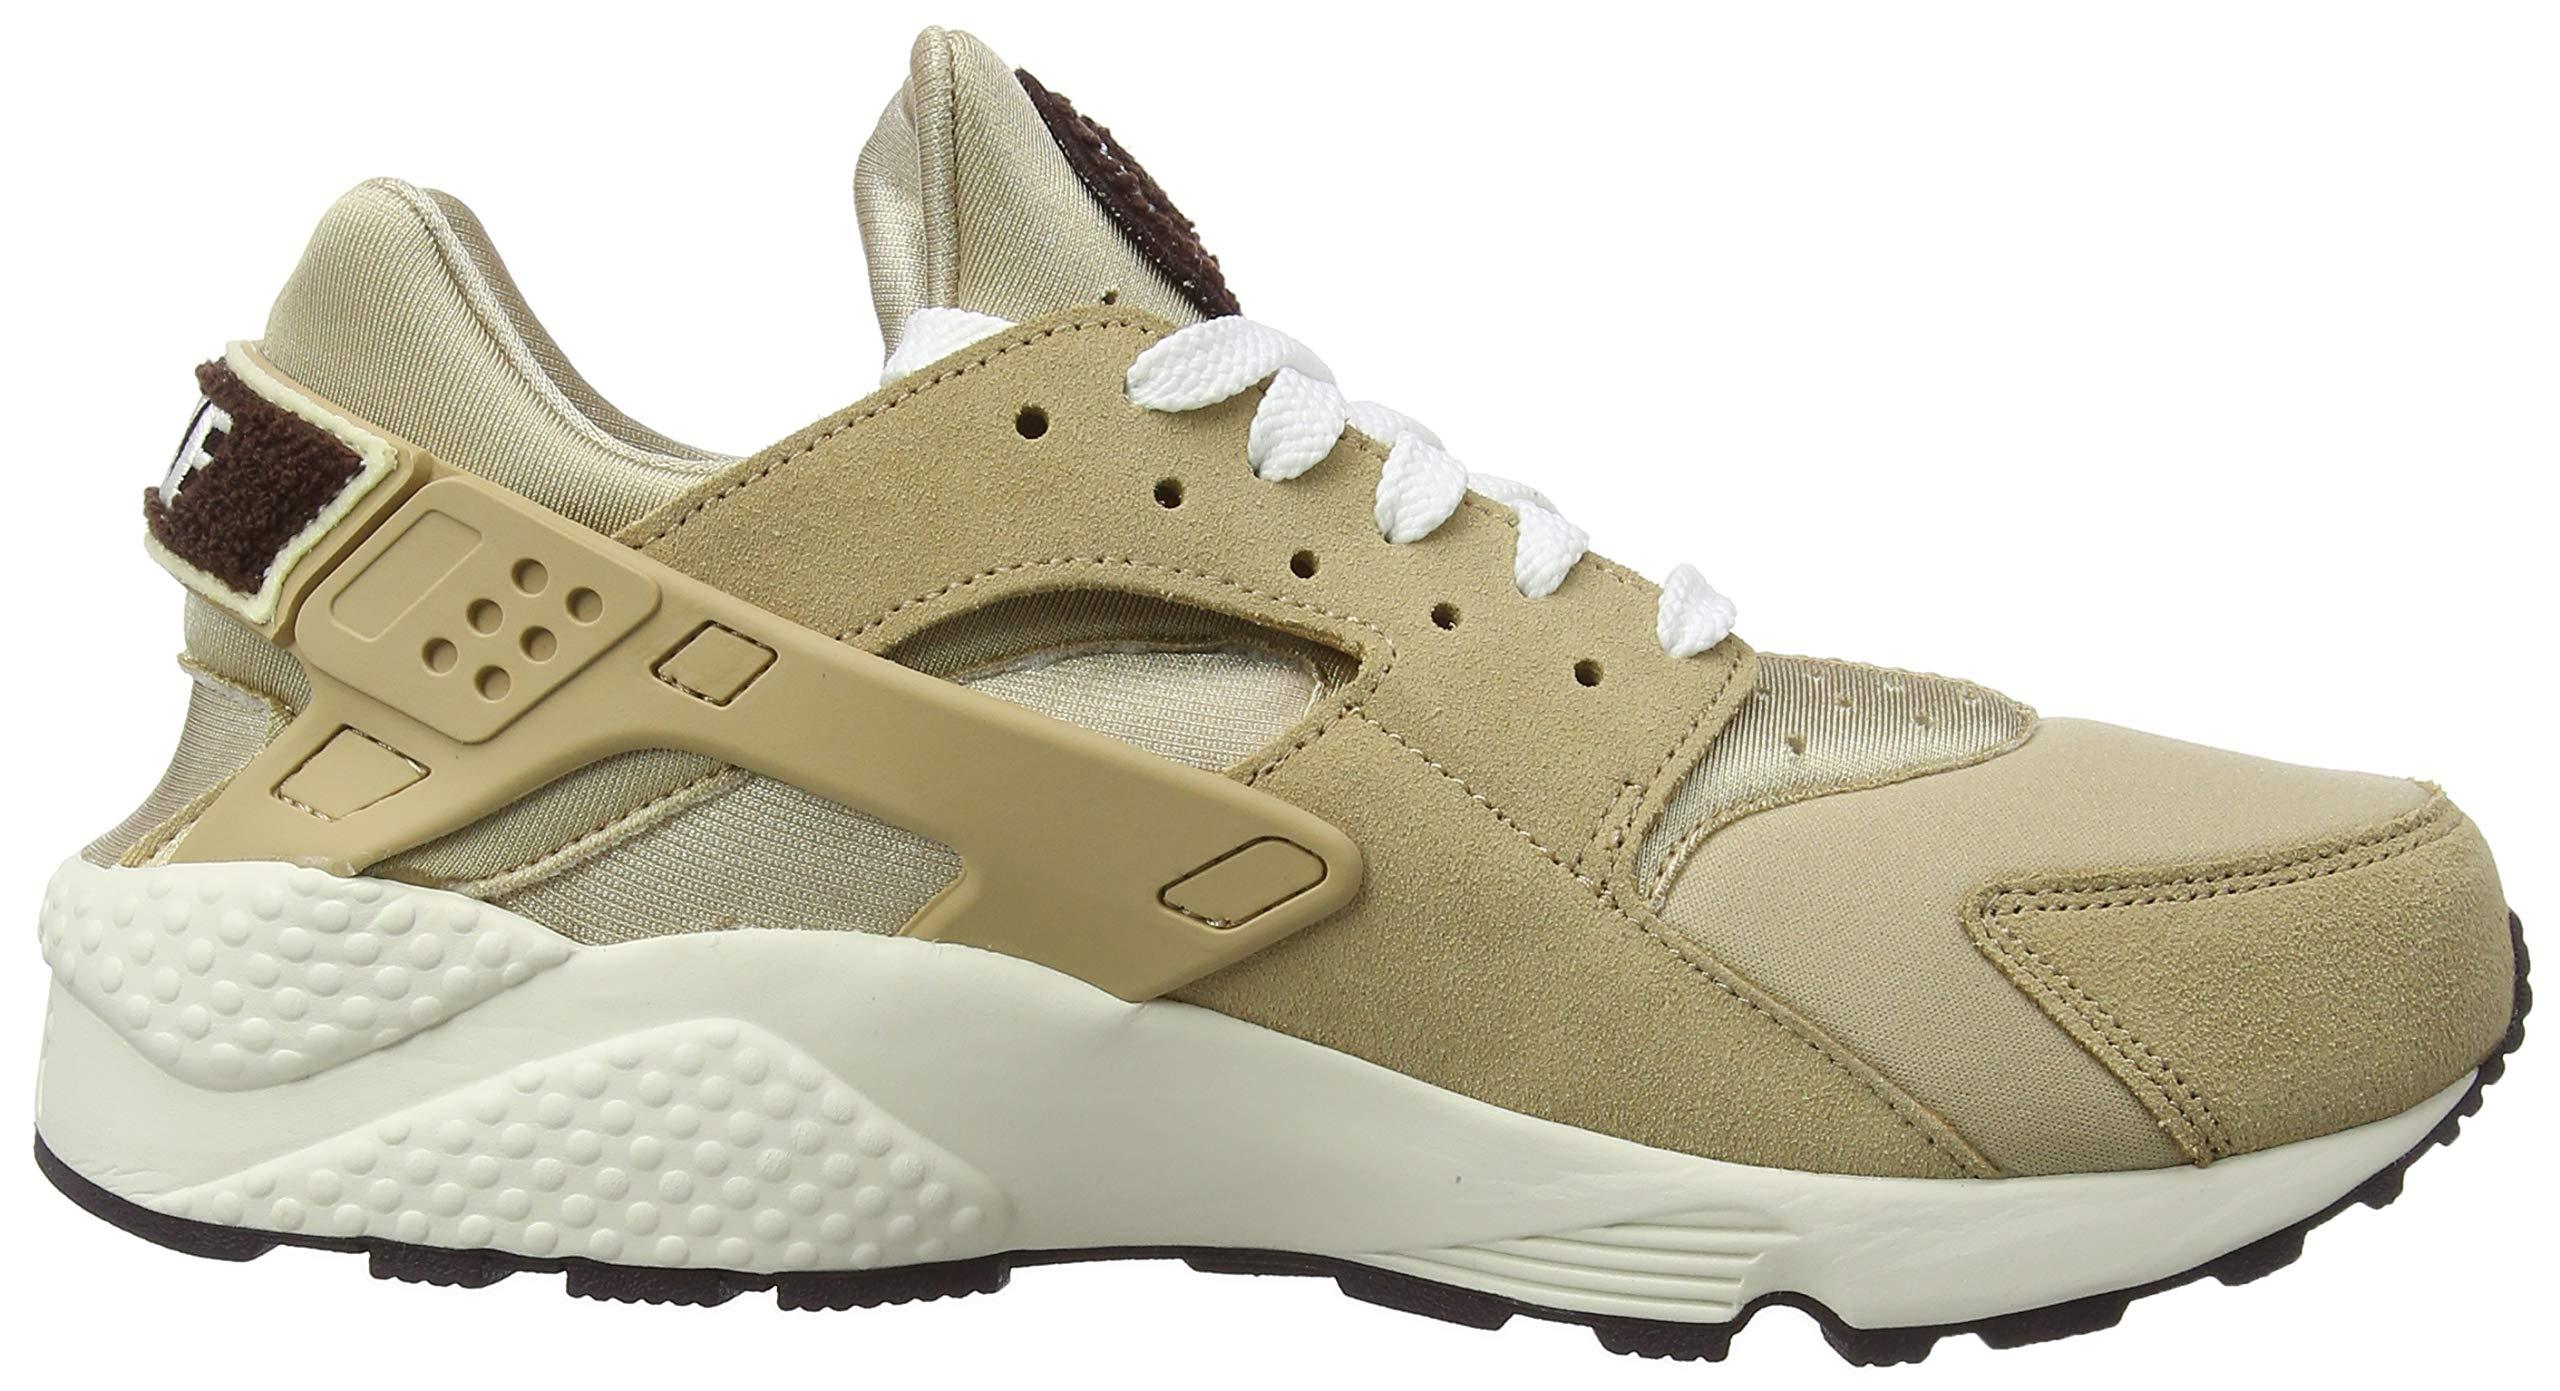 816dRU%2Bc3xL - Nike Men's Air Huarache Run PRM Fitness Shoes